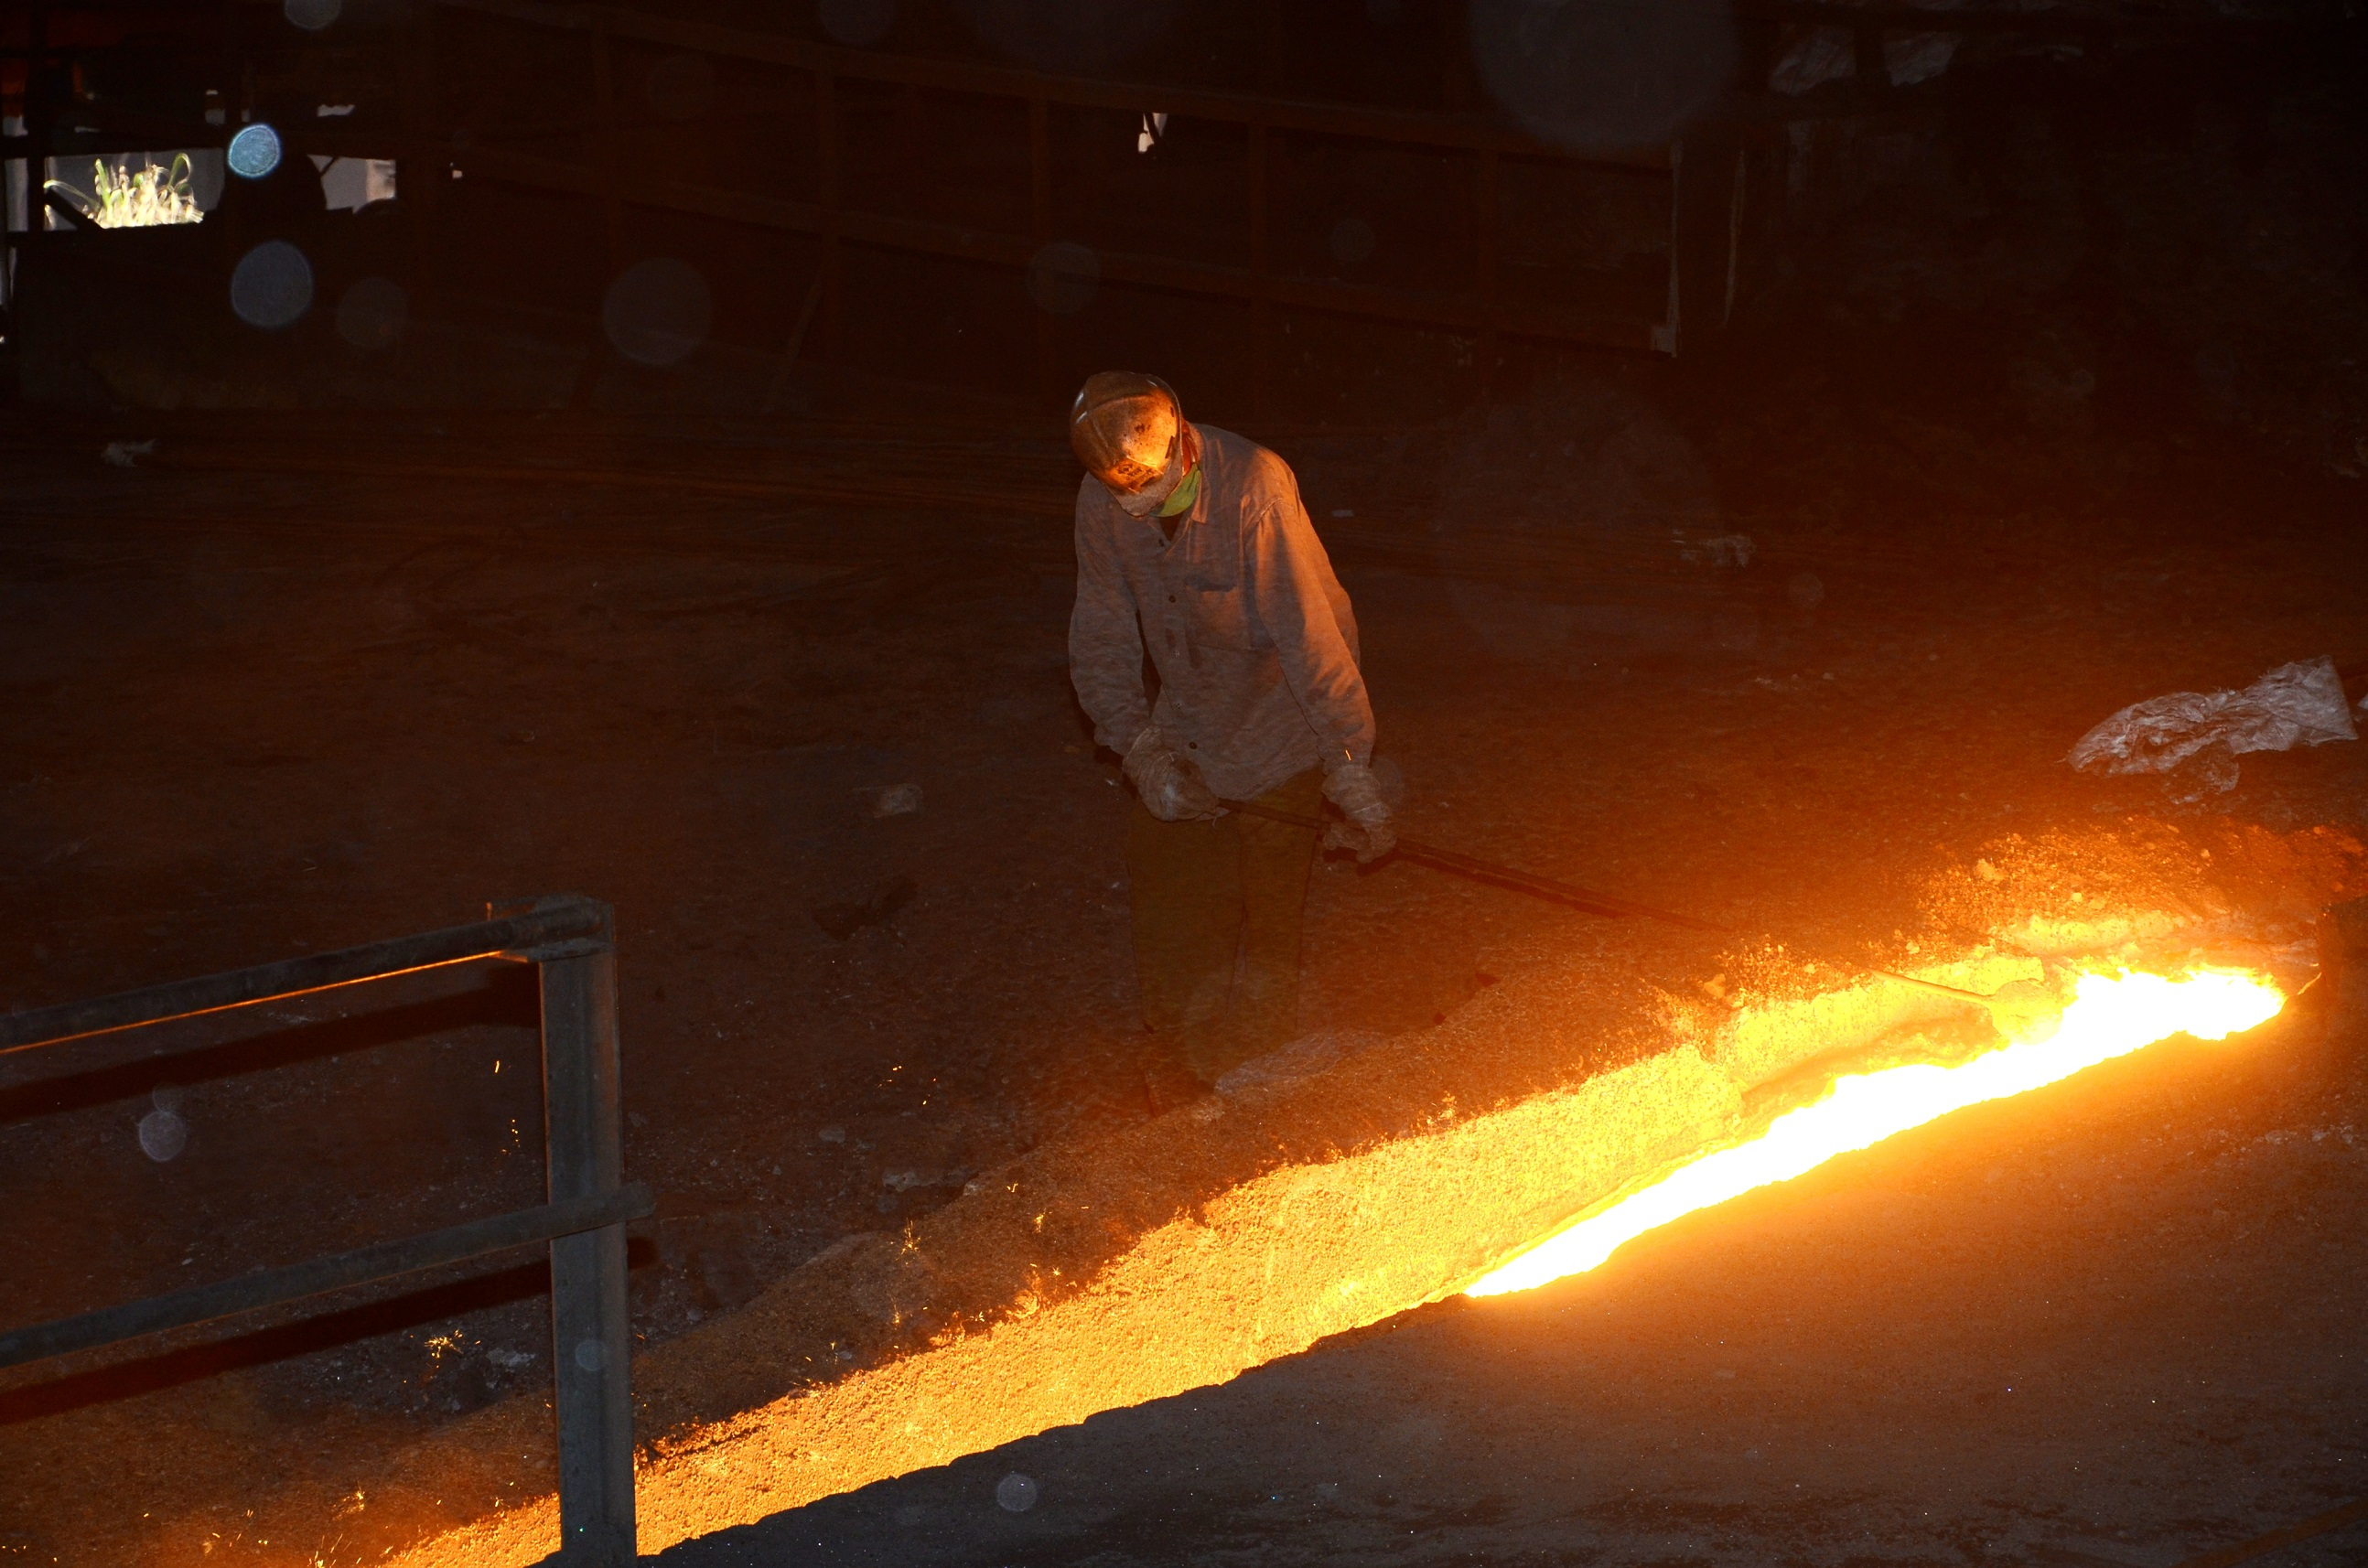 A worker near a BSL blast furnace